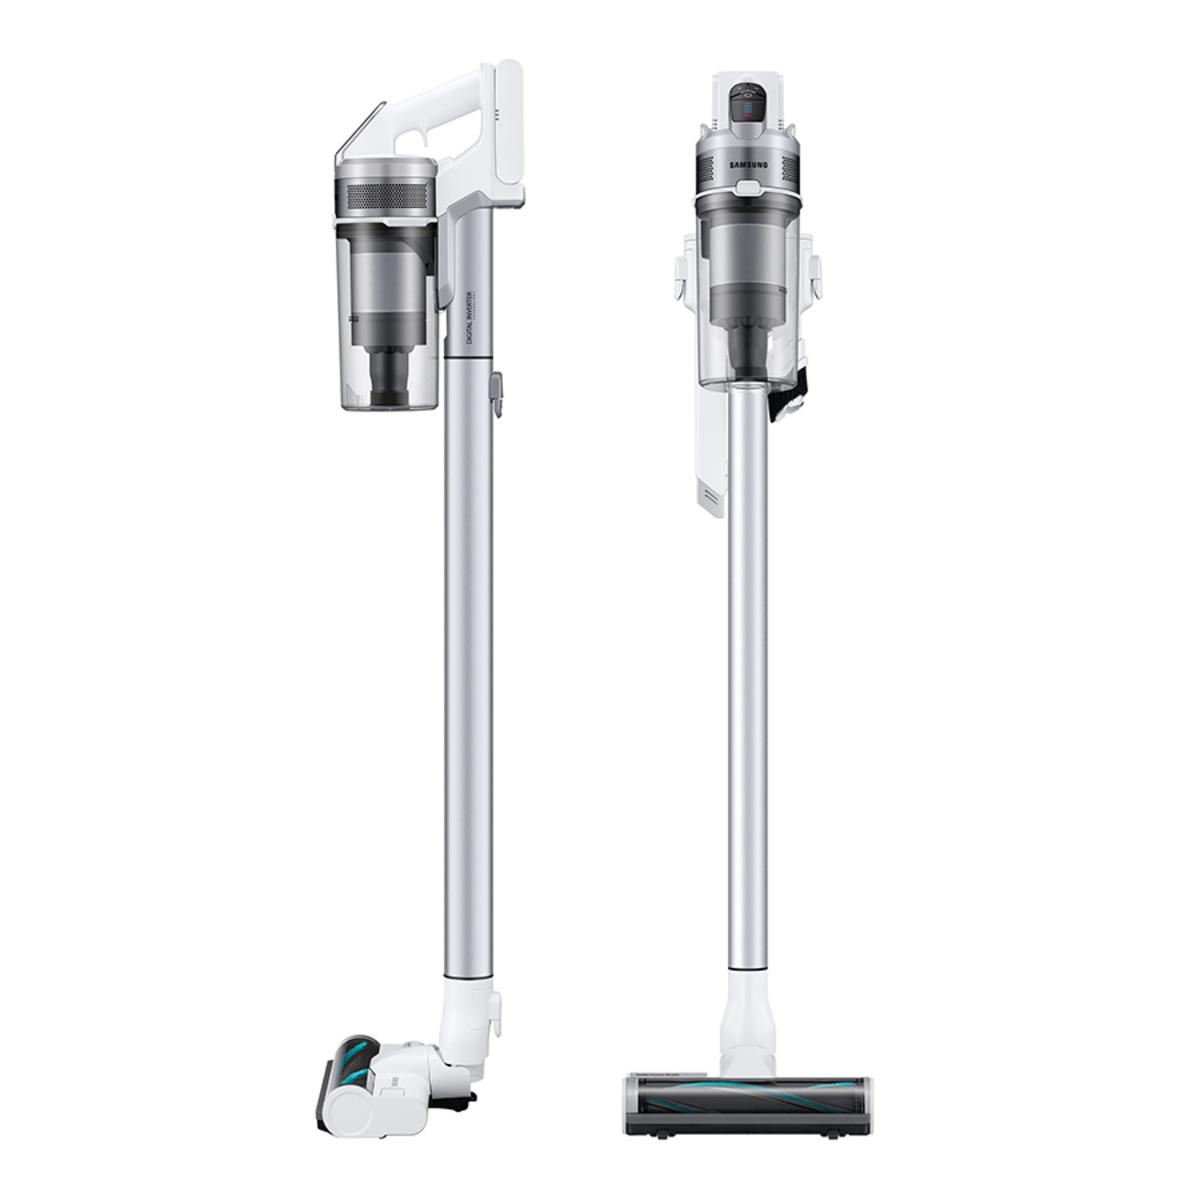 Samsung VS15T7036R5 Jet 70 Complete Cordless Vacuum Cleaner